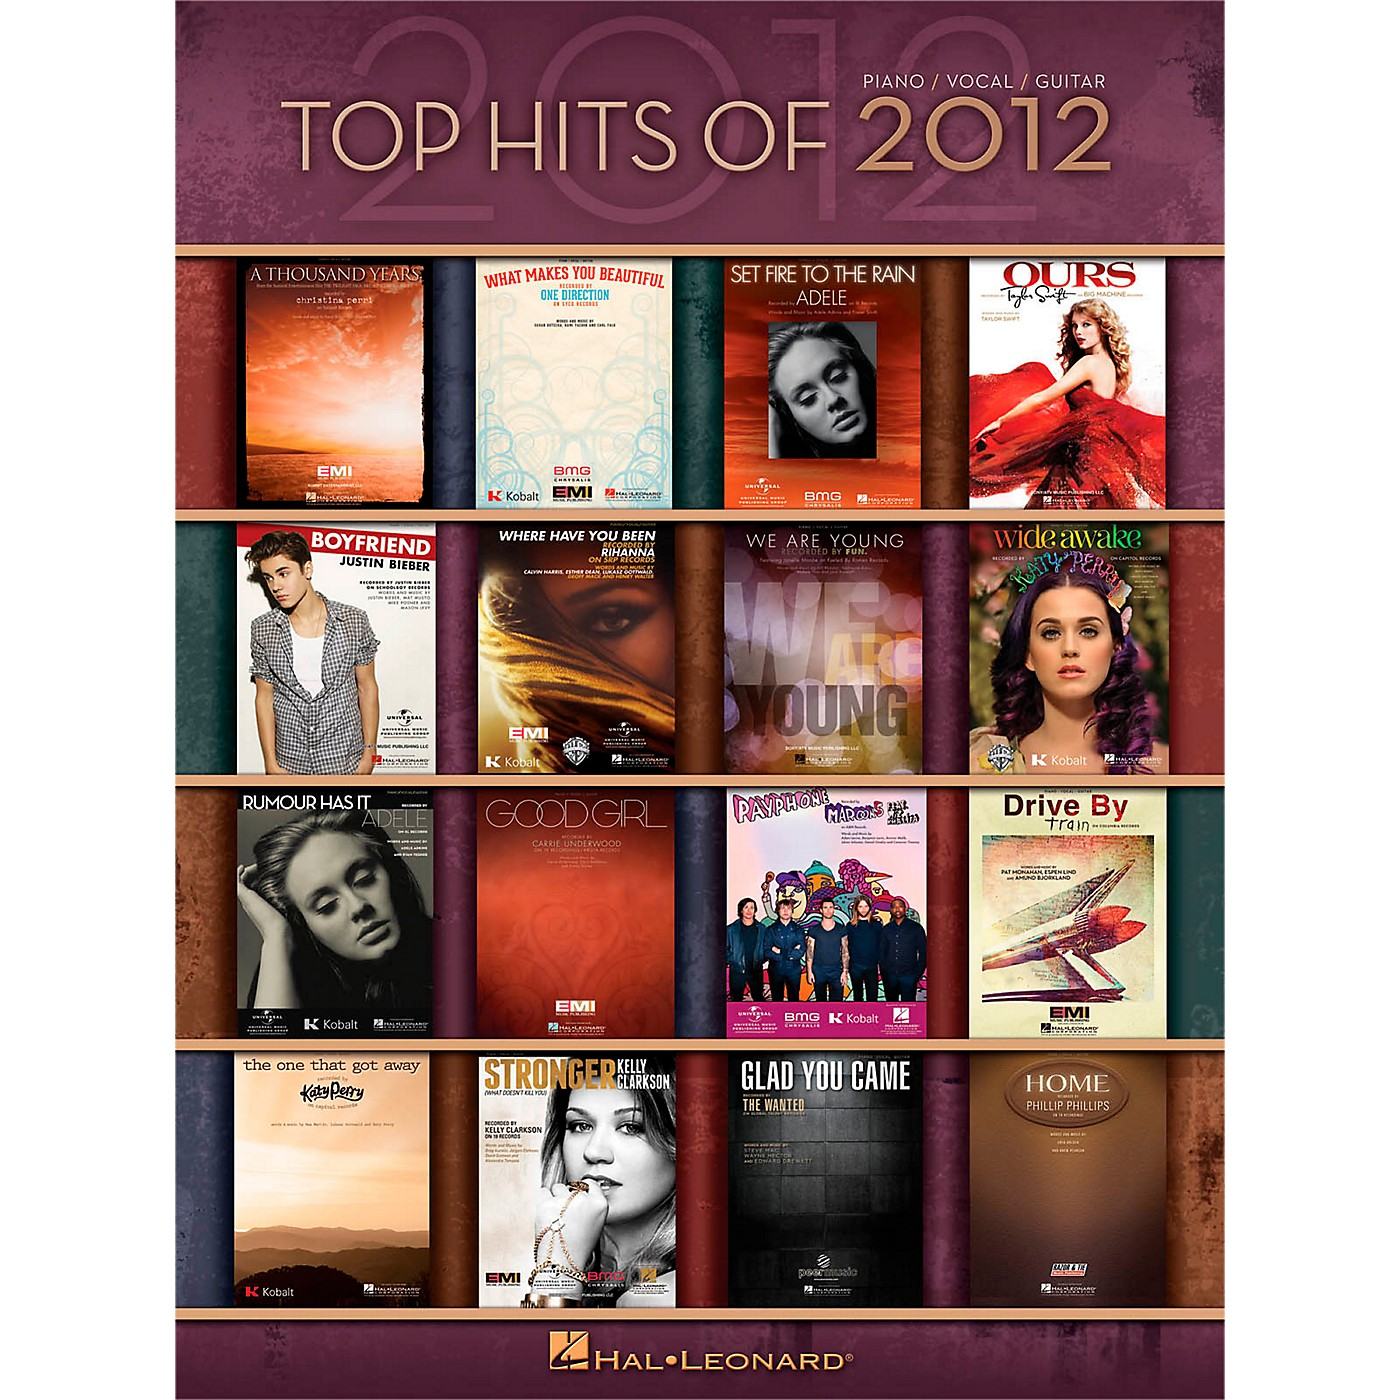 Hal Leonard Top Hits Of 2012 Piano/Vocal/Guitar Songbook thumbnail